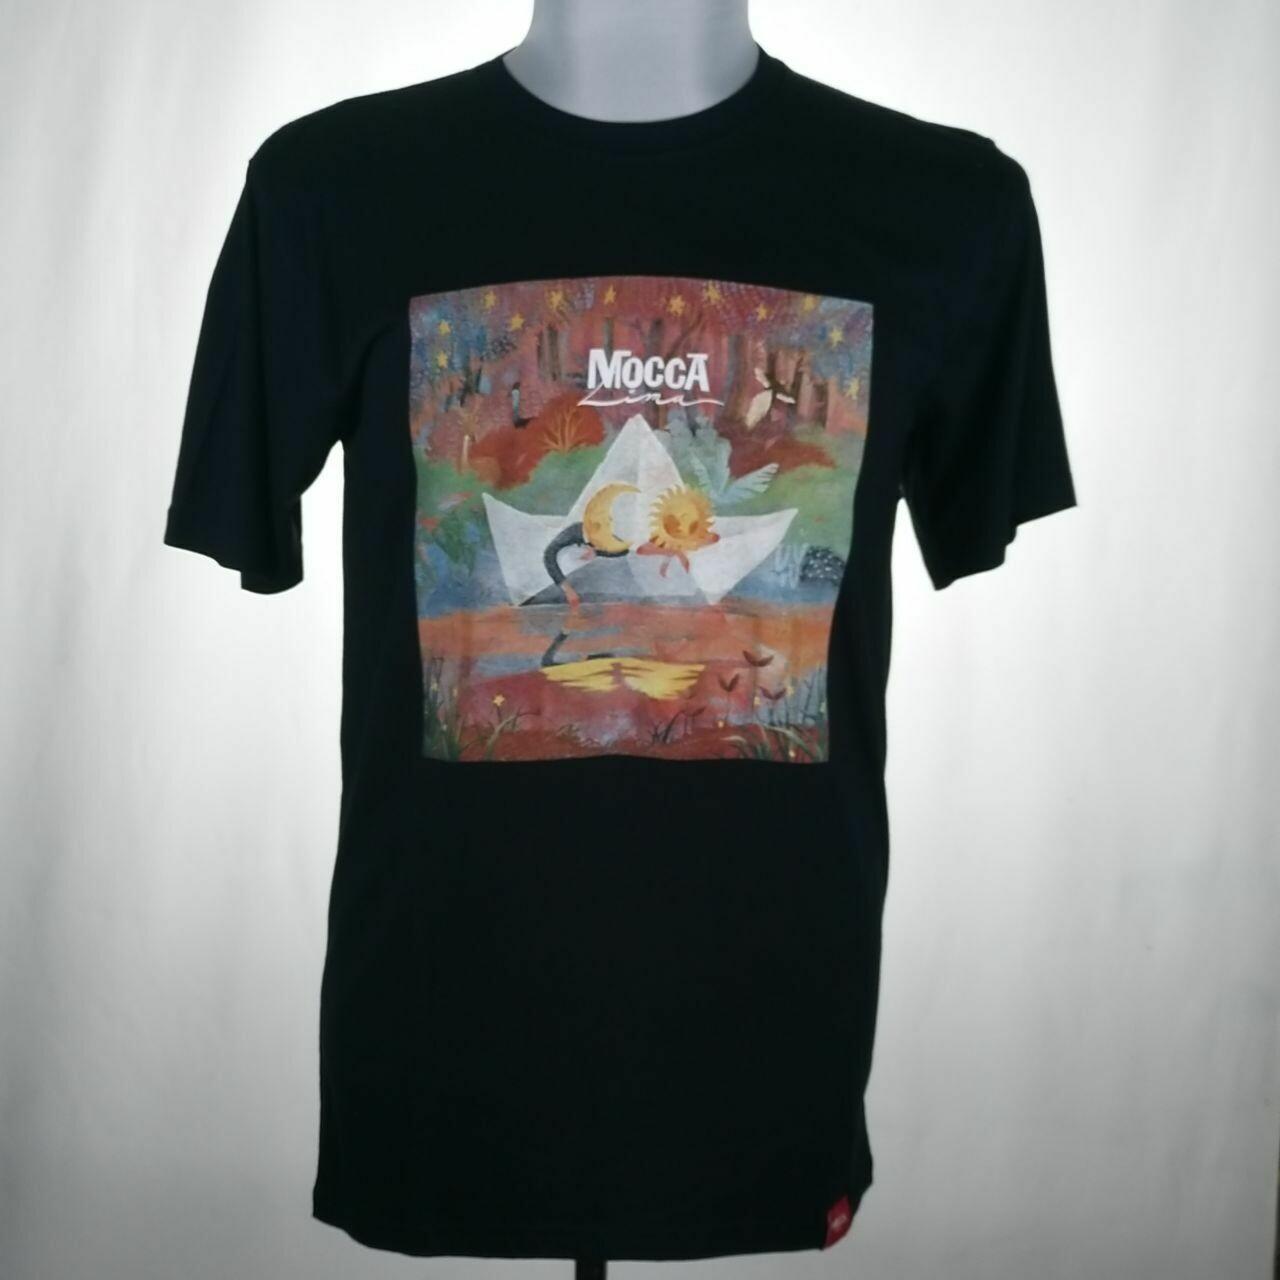 MOCCA -LIMA- (BLACK)